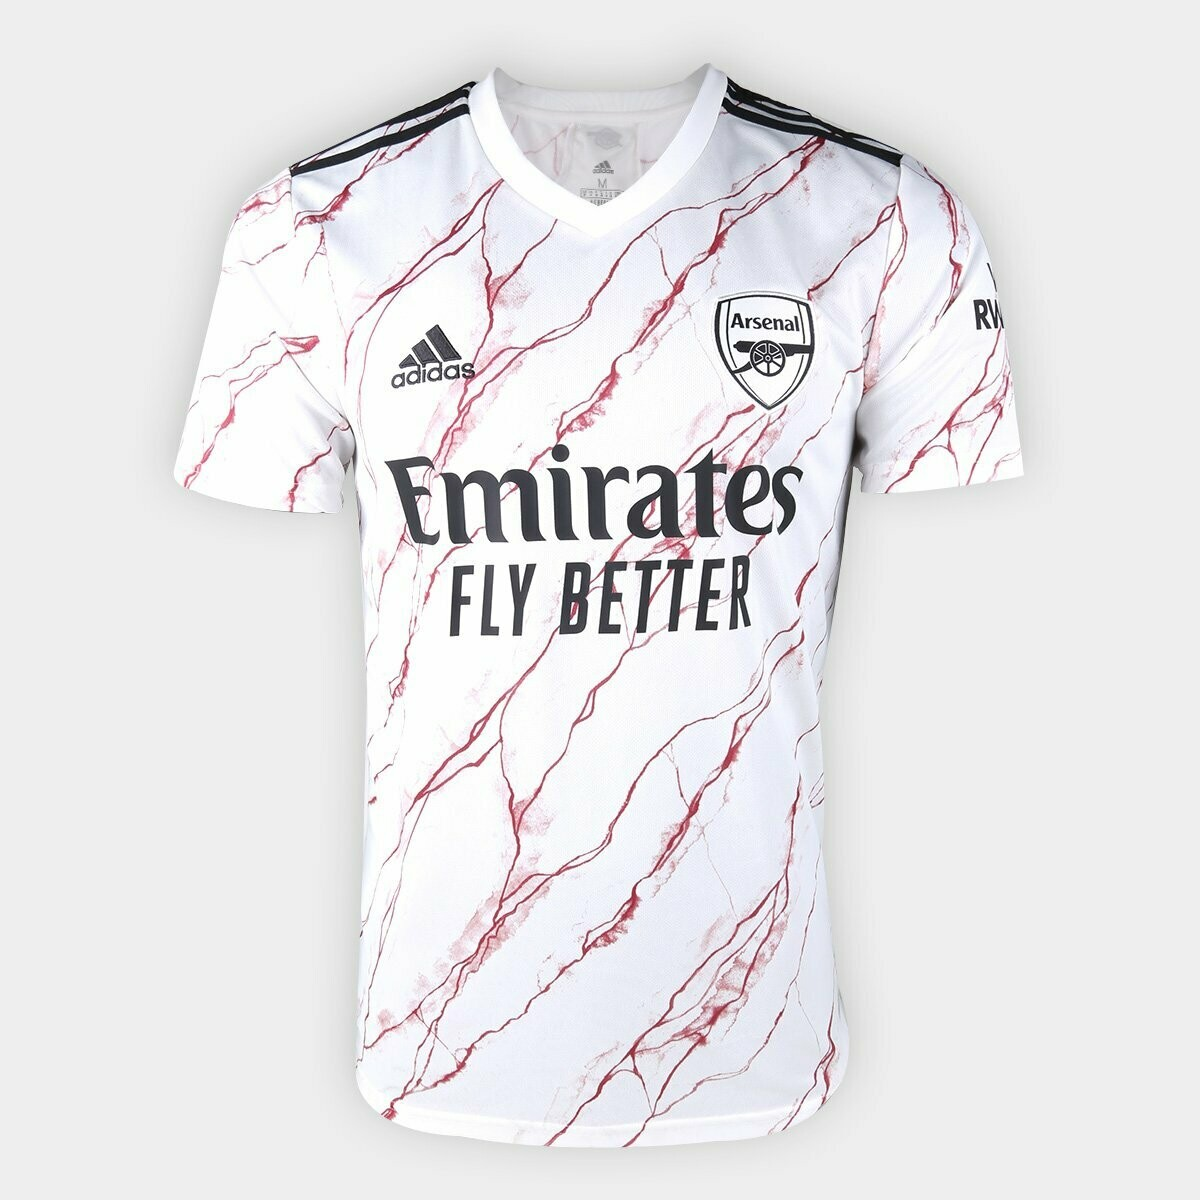 Camisa Arsenal Away 20/21 Torcedor Adidas Masculina - Branco e Preto